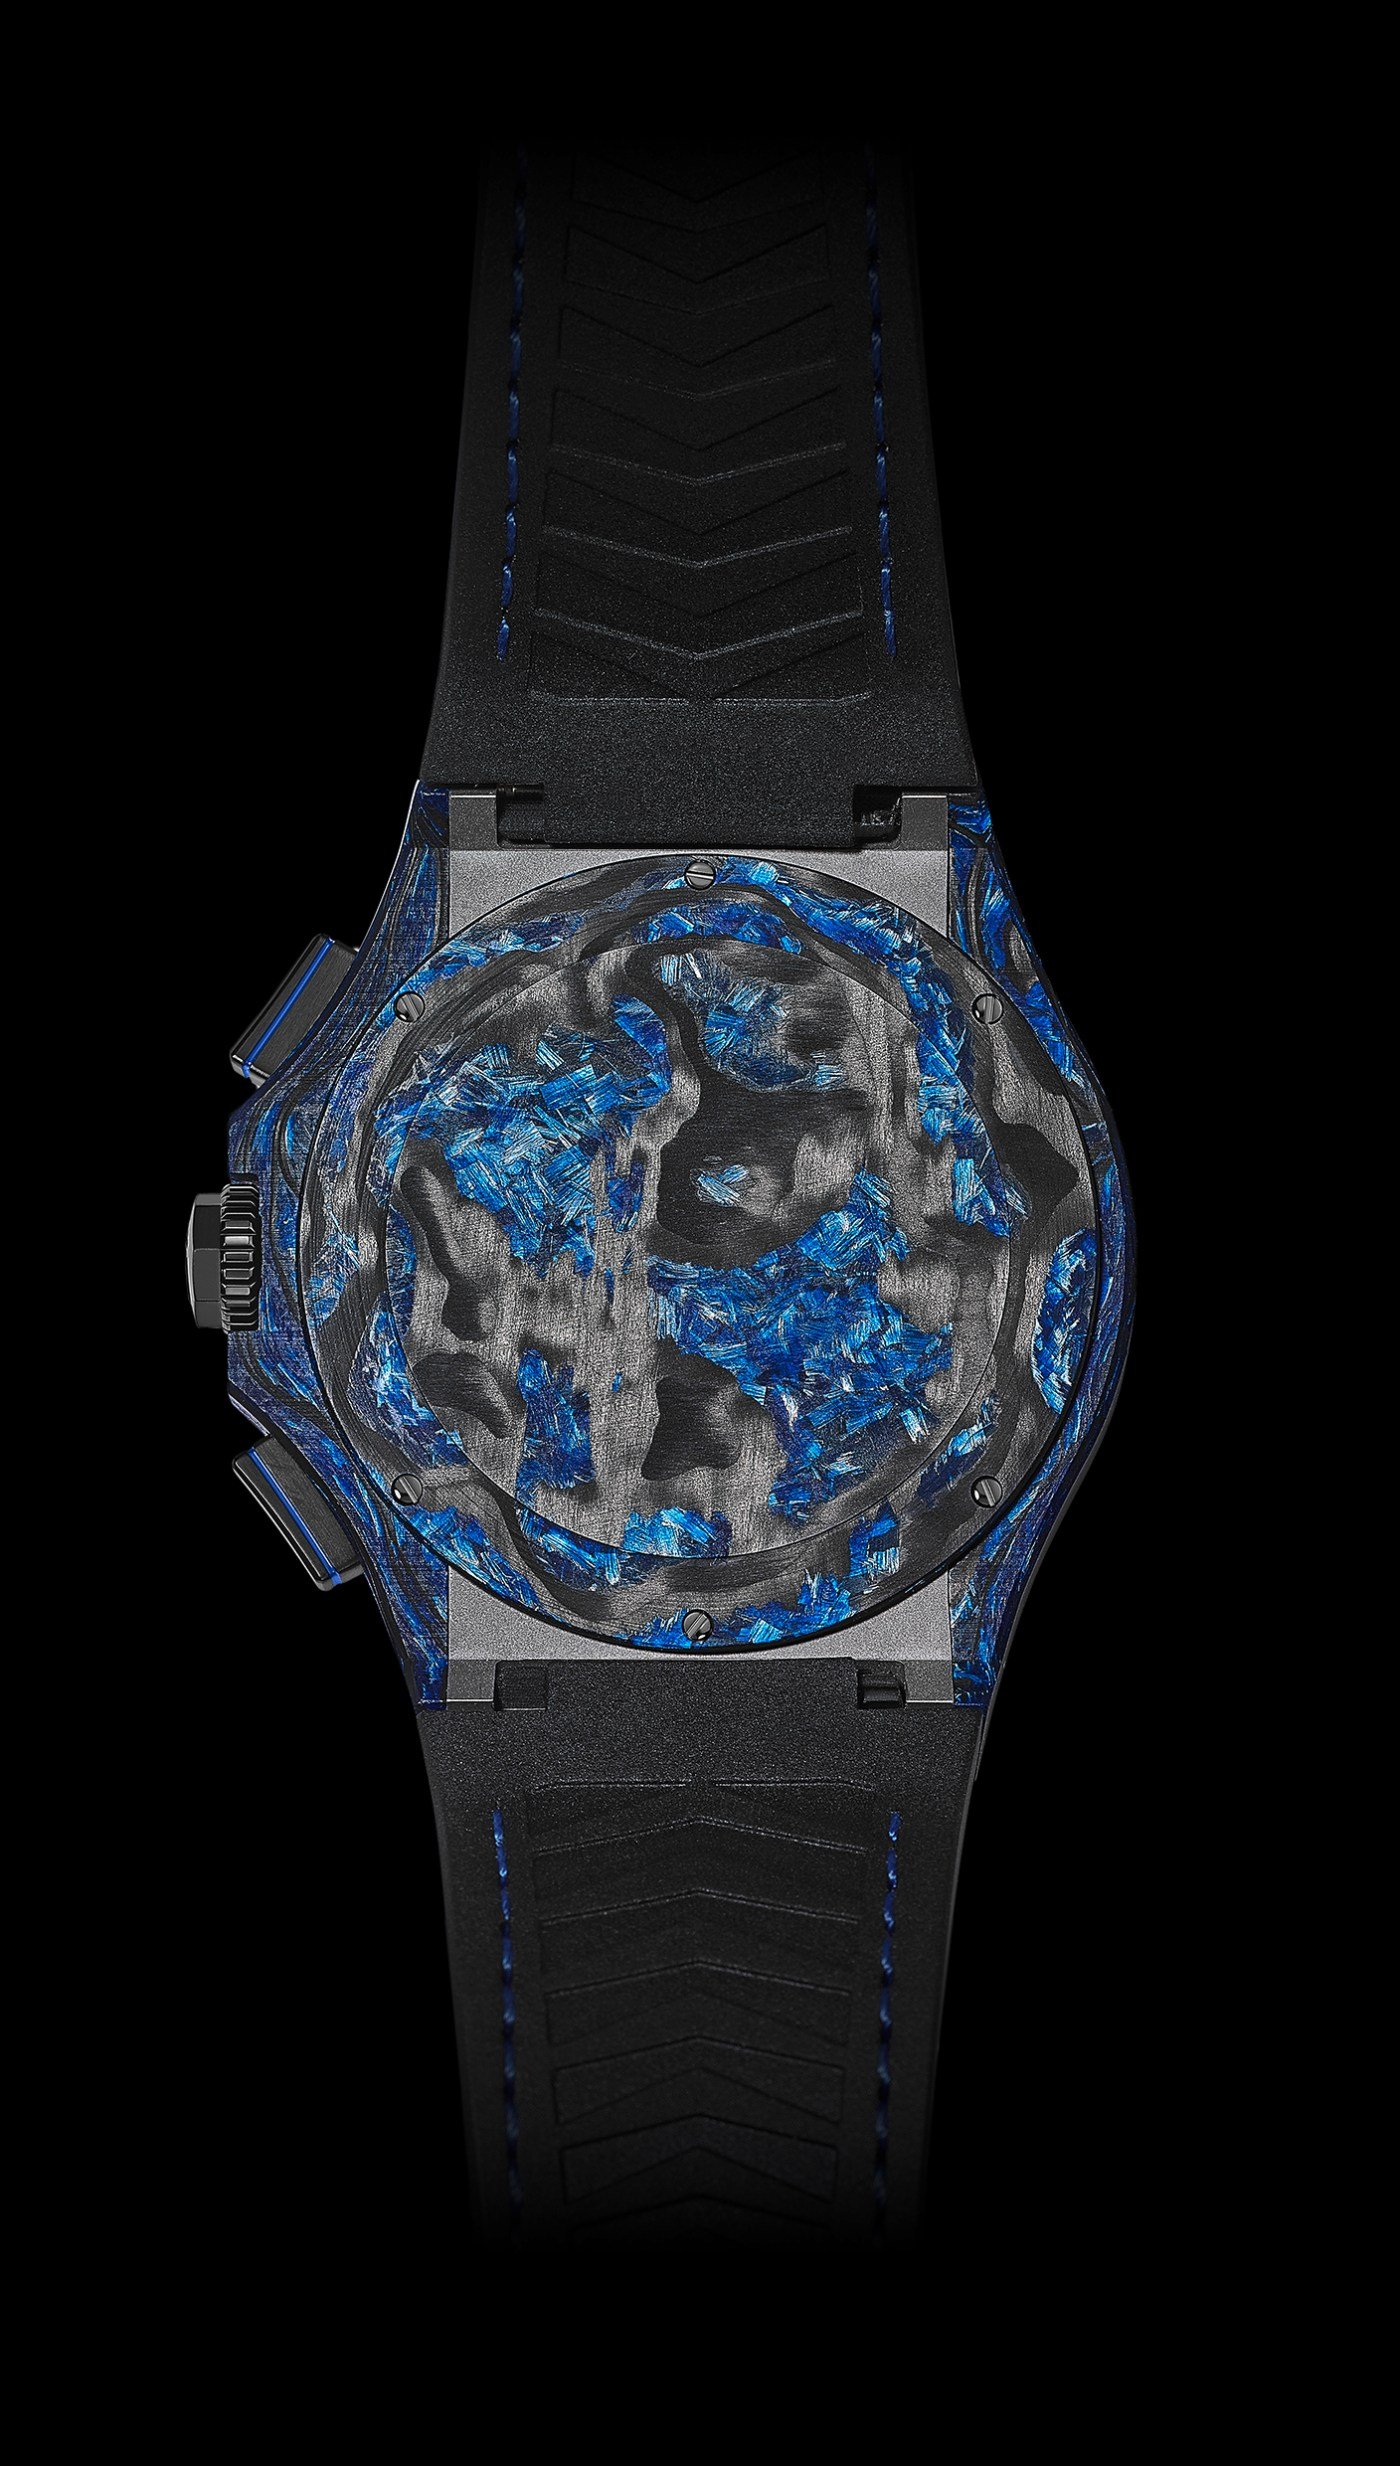 Girard-Perregaux Carbon Glass Concept Watch caseback